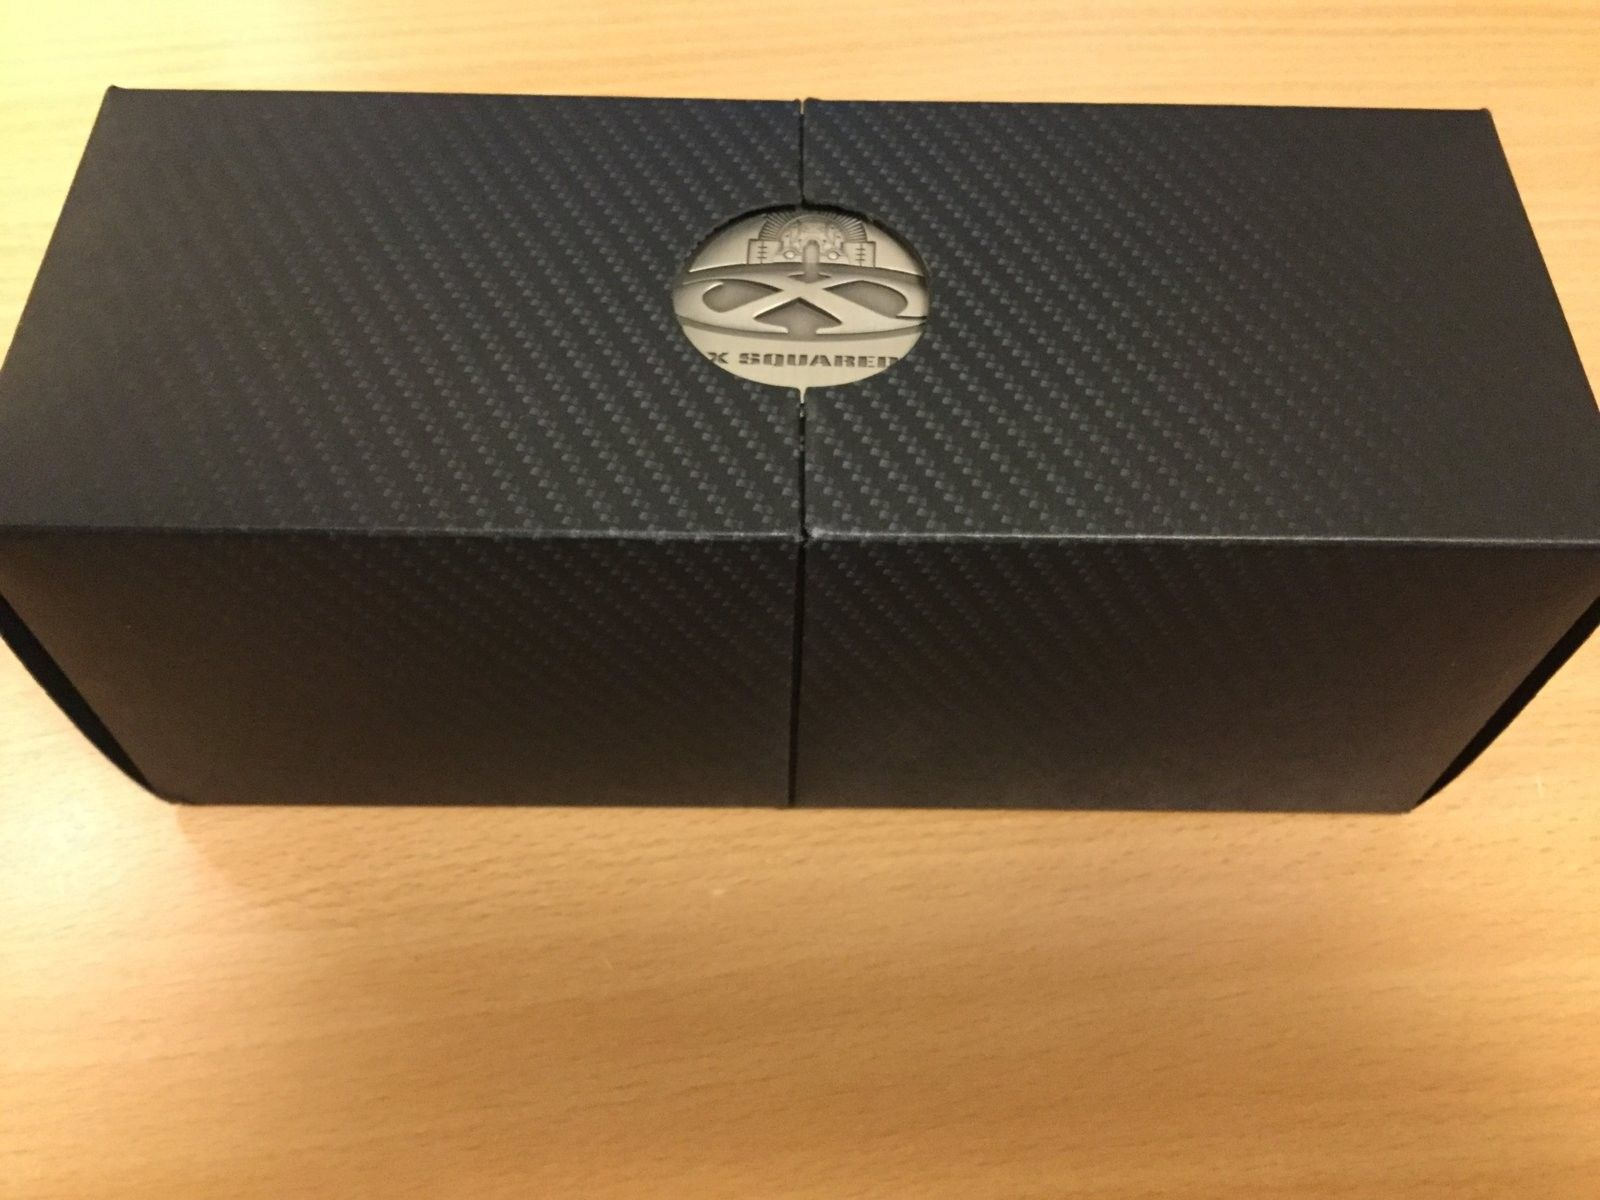 XS Box Polished Carbon - last price drop! - IMG_4442.JPG